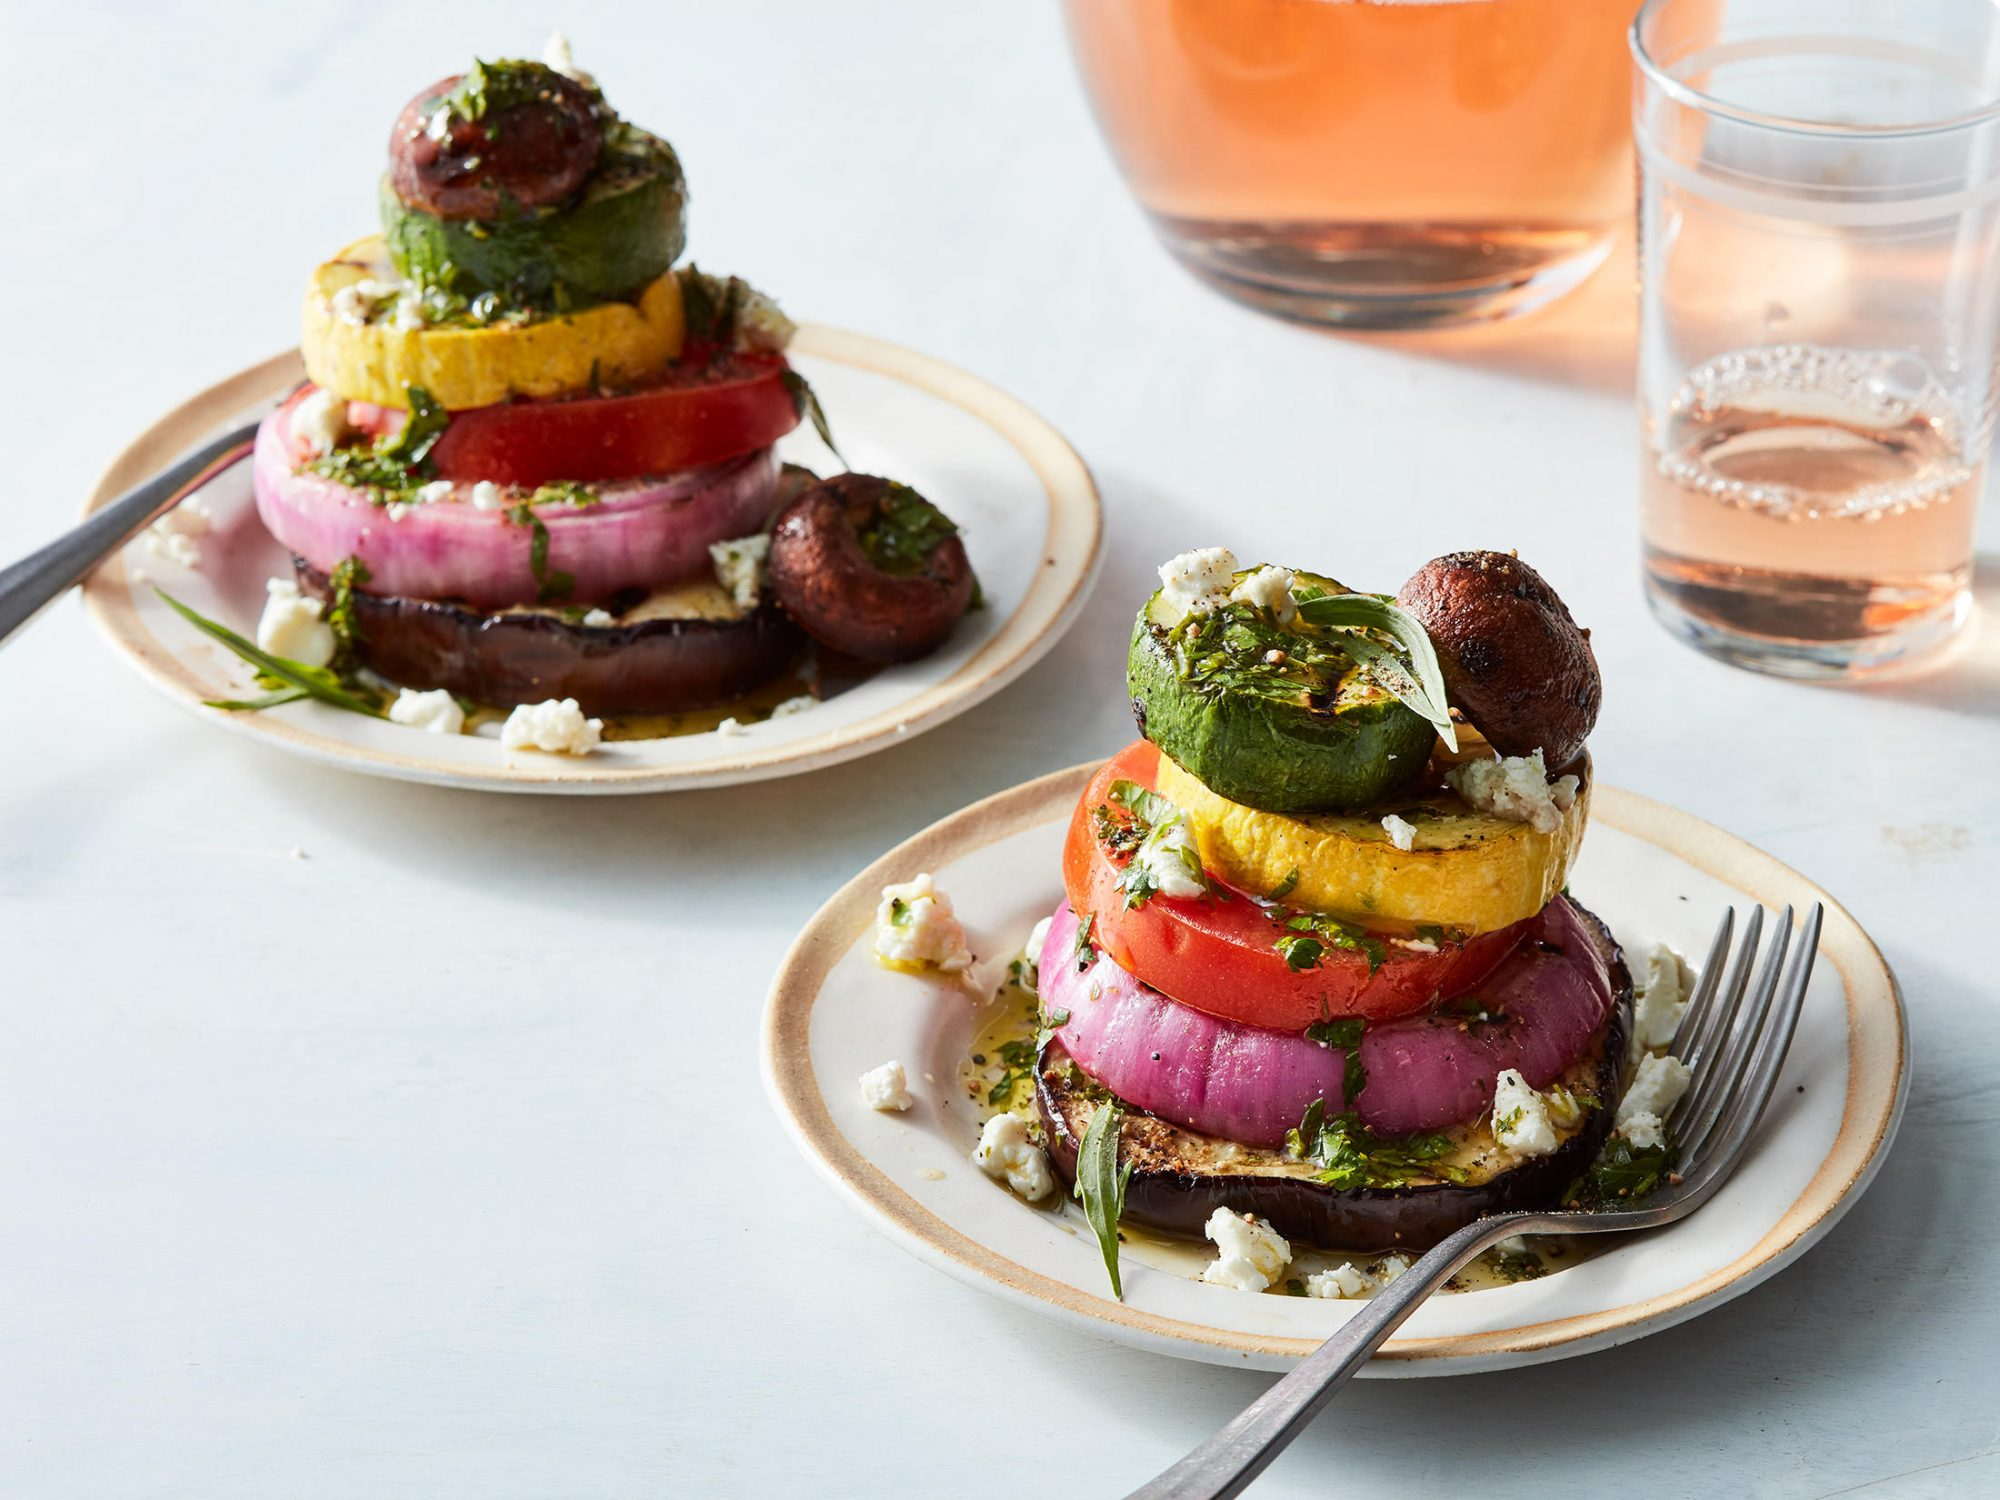 Grilled Vegetable Stacks With Herb Vinaigrette